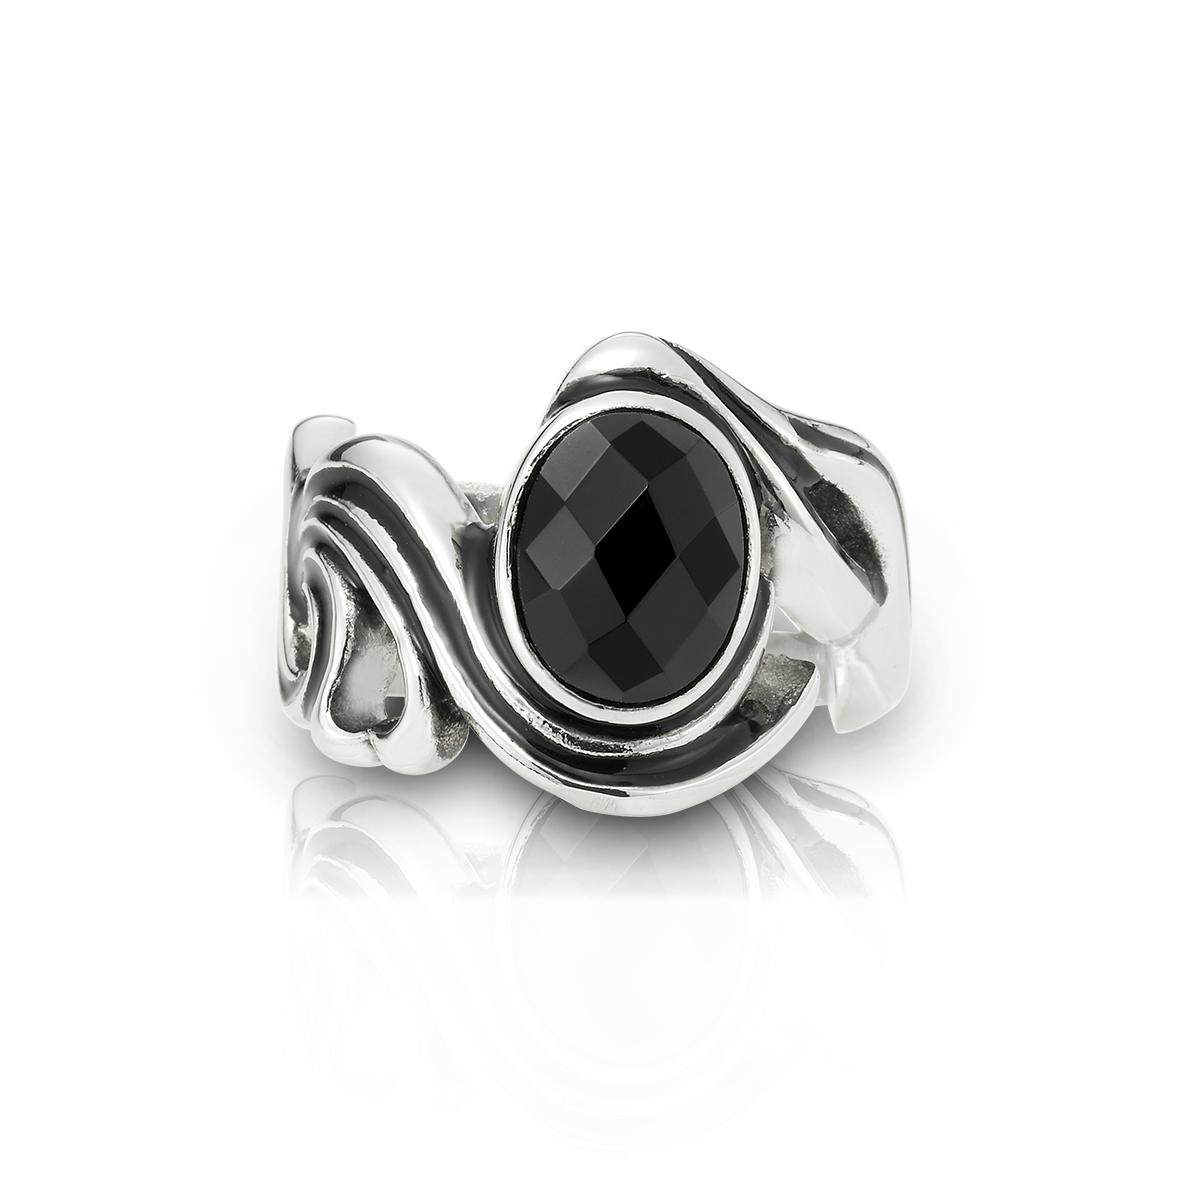 K121 復古菱格紋黑瑪瑙戒指